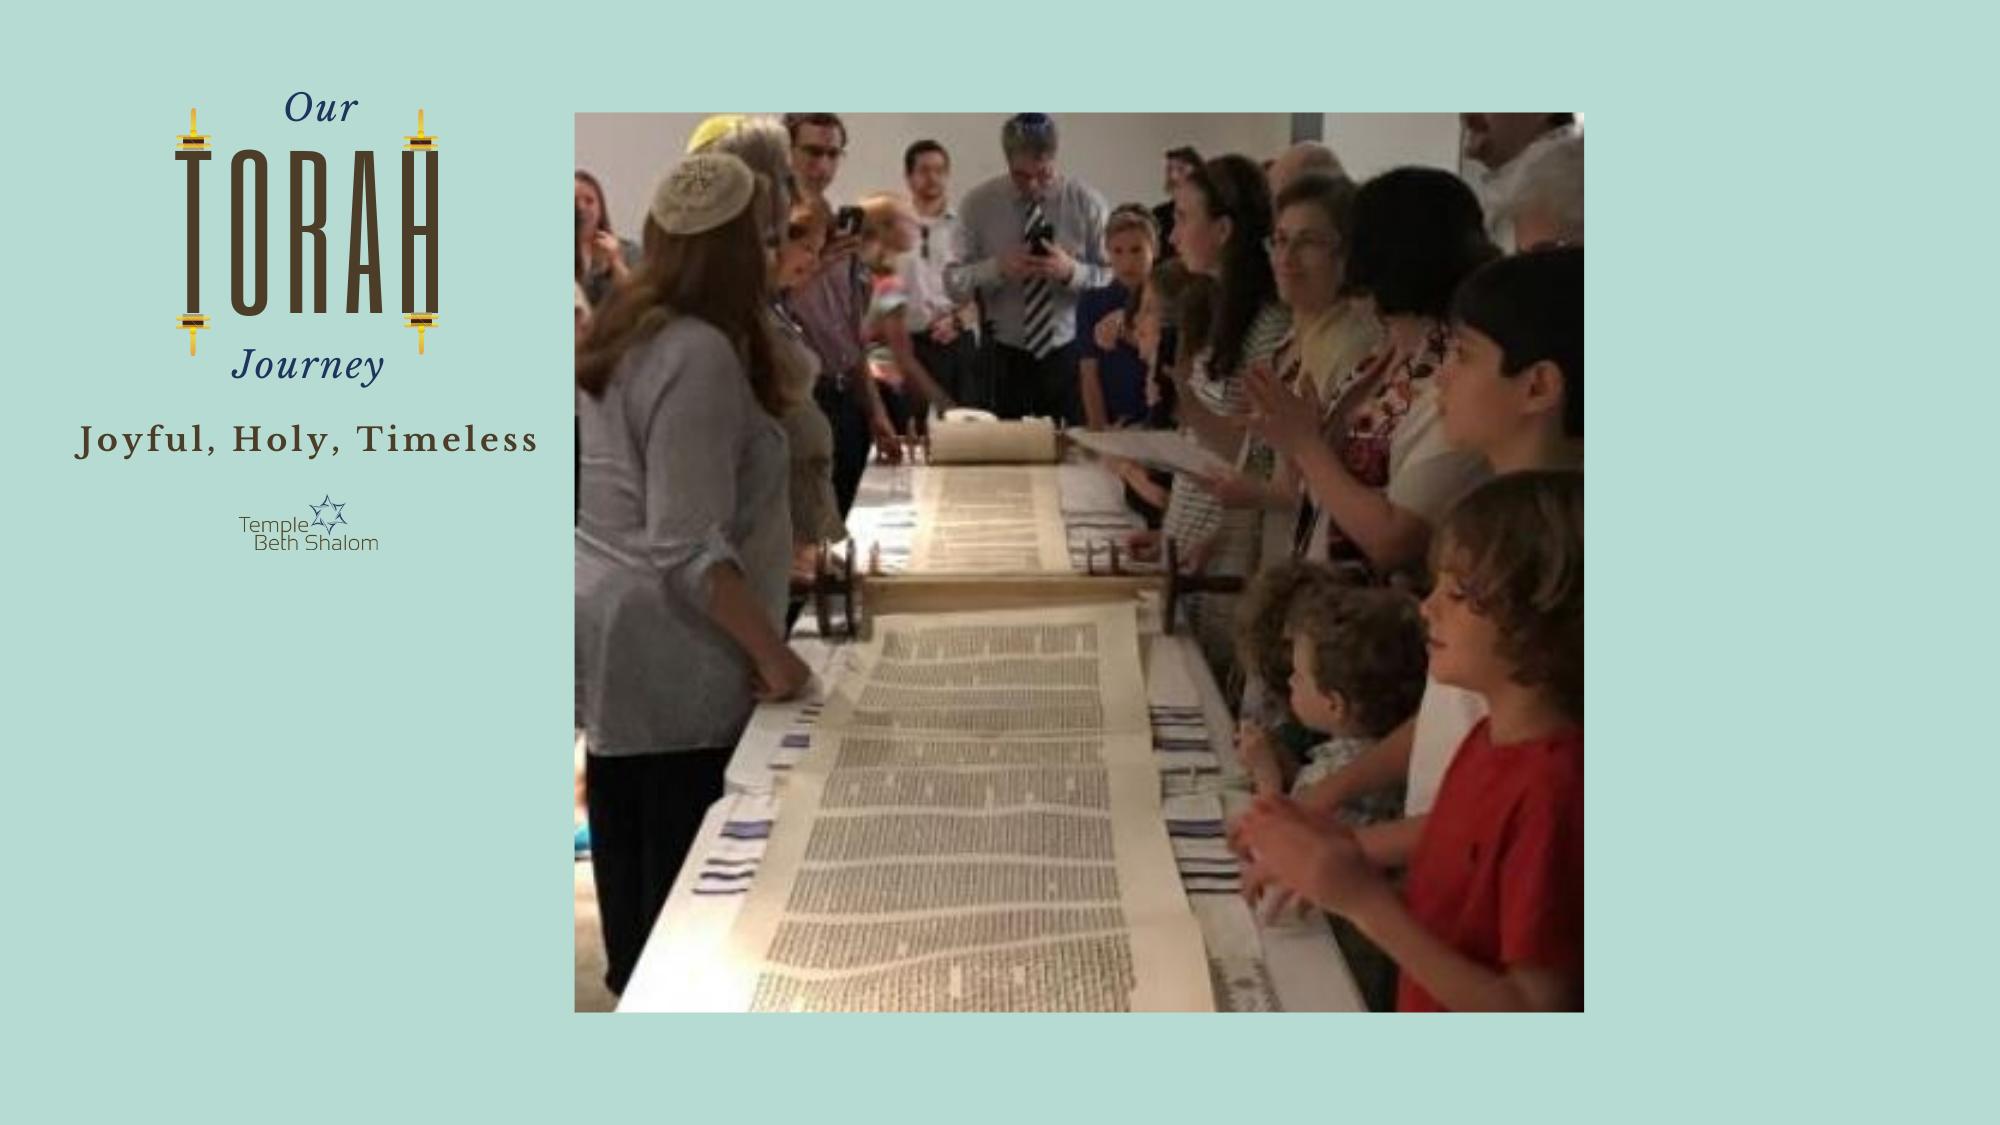 "<a href=""https://www.bethshalomaustin.org/torah-journey""                                     target="""">                                                                 <span class=""slider_title"">                                     Our Torah Journey                                </span>                                                                 </a>                                                                                                                                                                                       <span class=""slider_description"">Be a part of our joyful Torah restoration experience!</span>                                                                                     <a href=""https://www.bethshalomaustin.org/torah-journey"" class=""slider_link""                             target="""">                             Learn more.                            </a>"